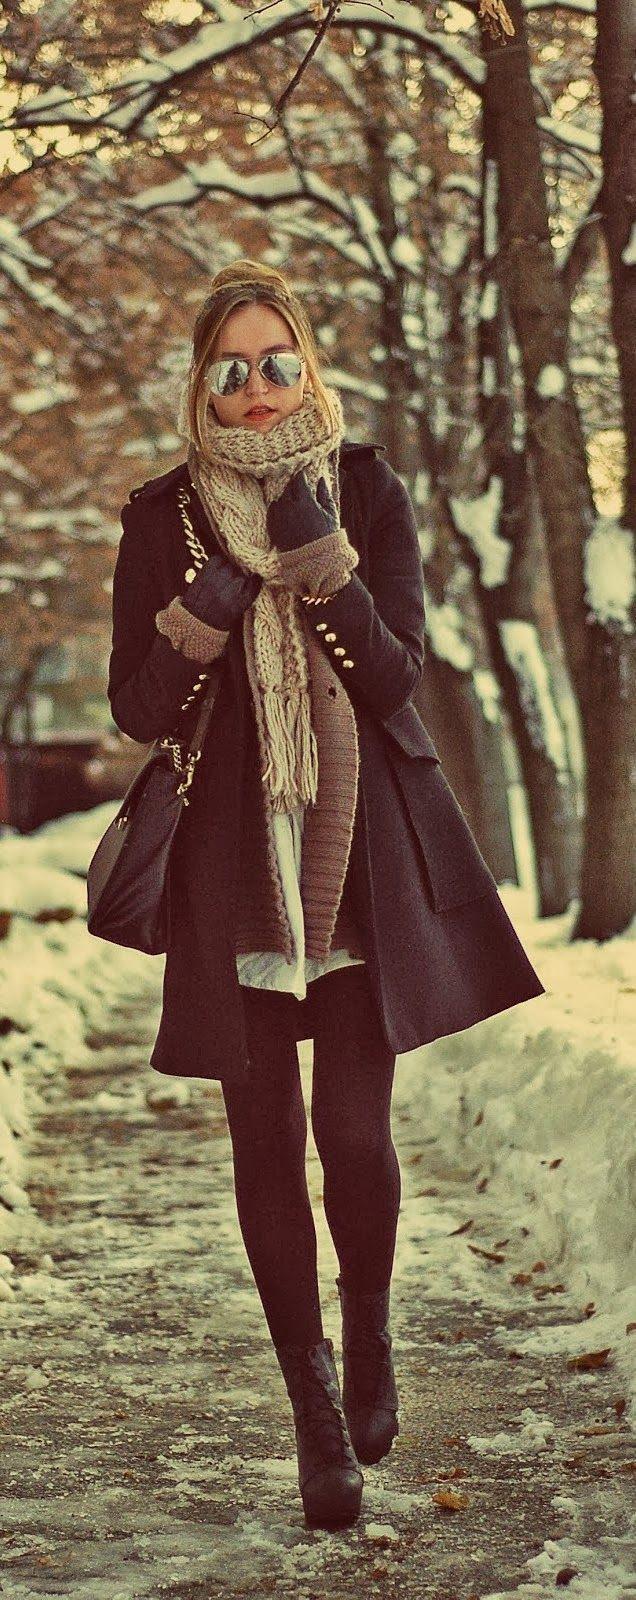 Winter's coming!!!!